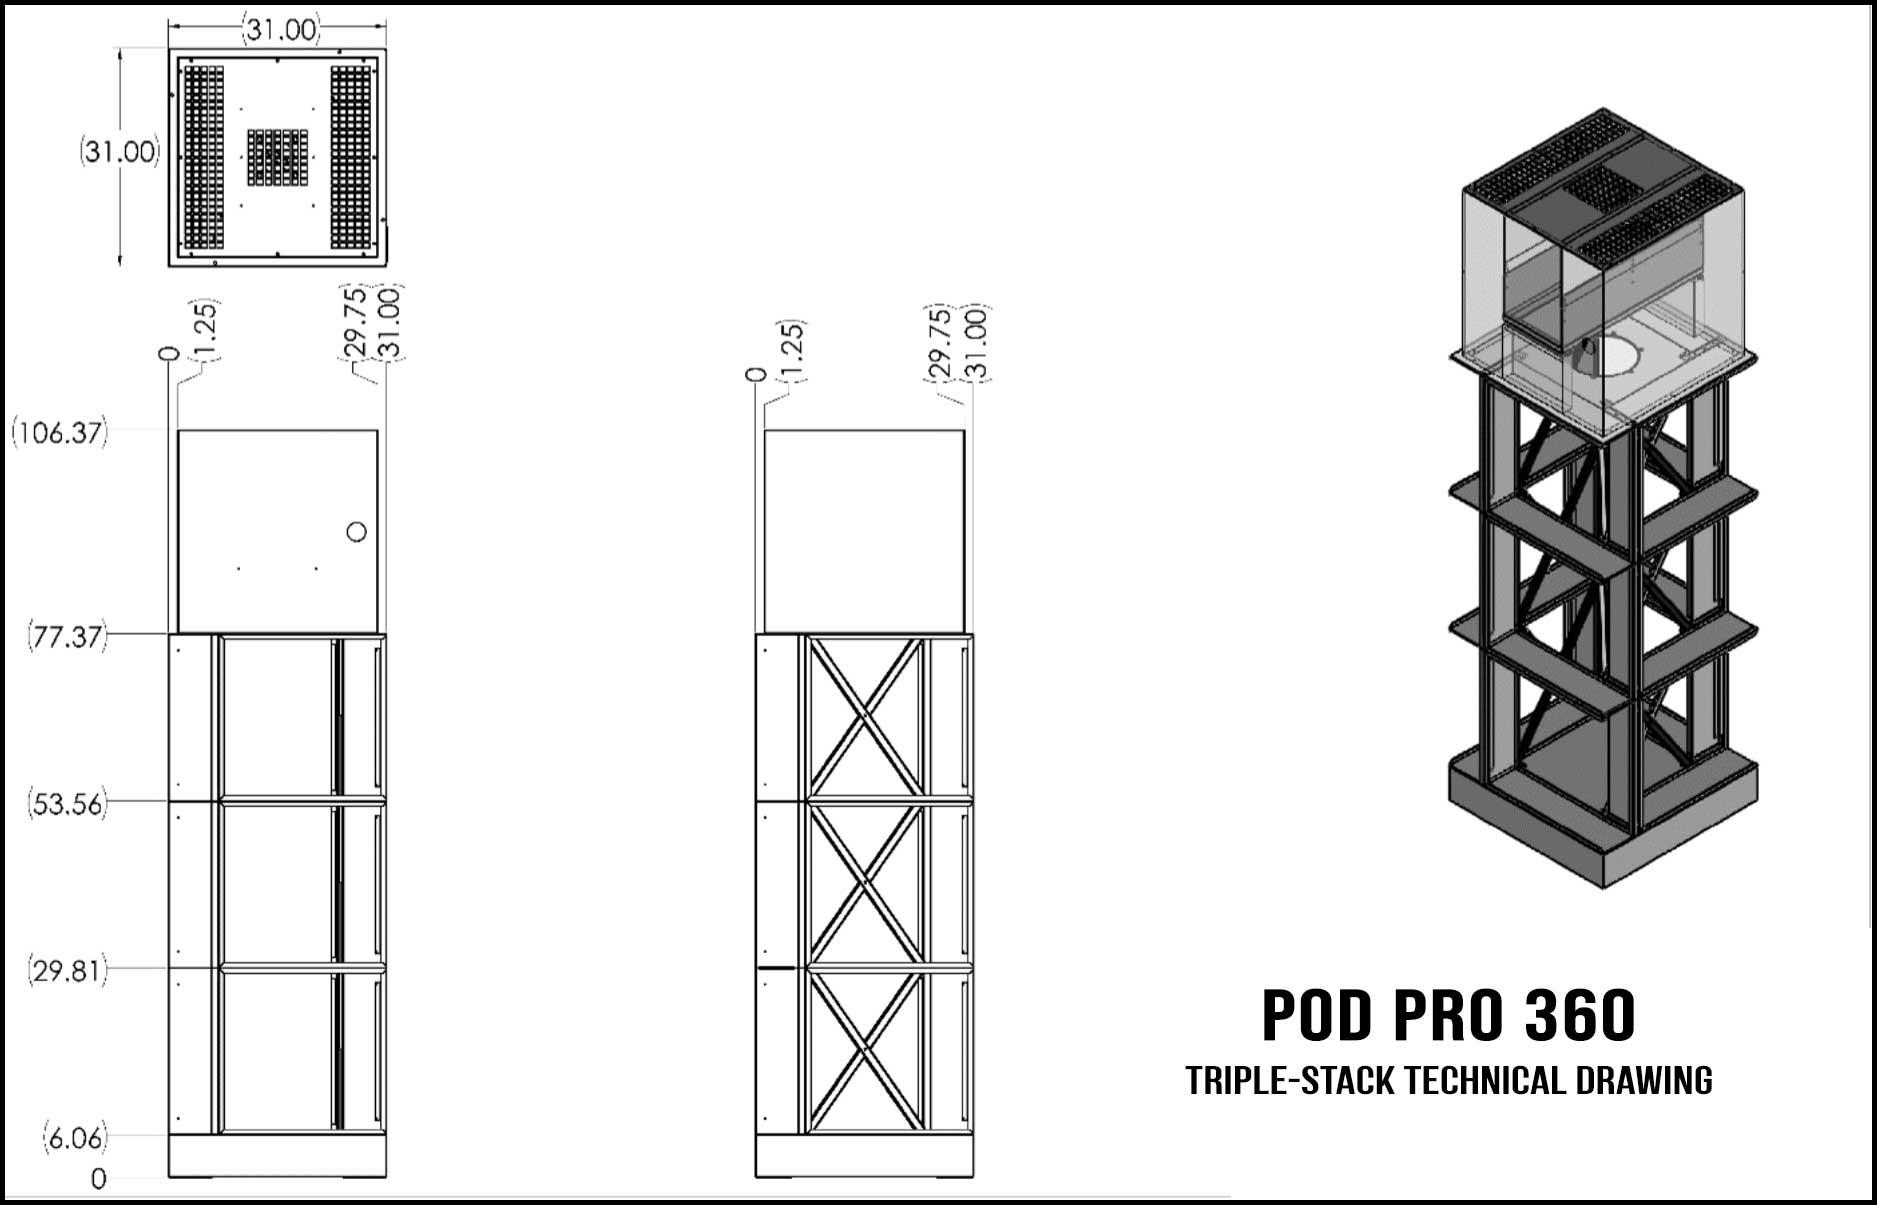 The Pod Pro 360 Series Downdraft